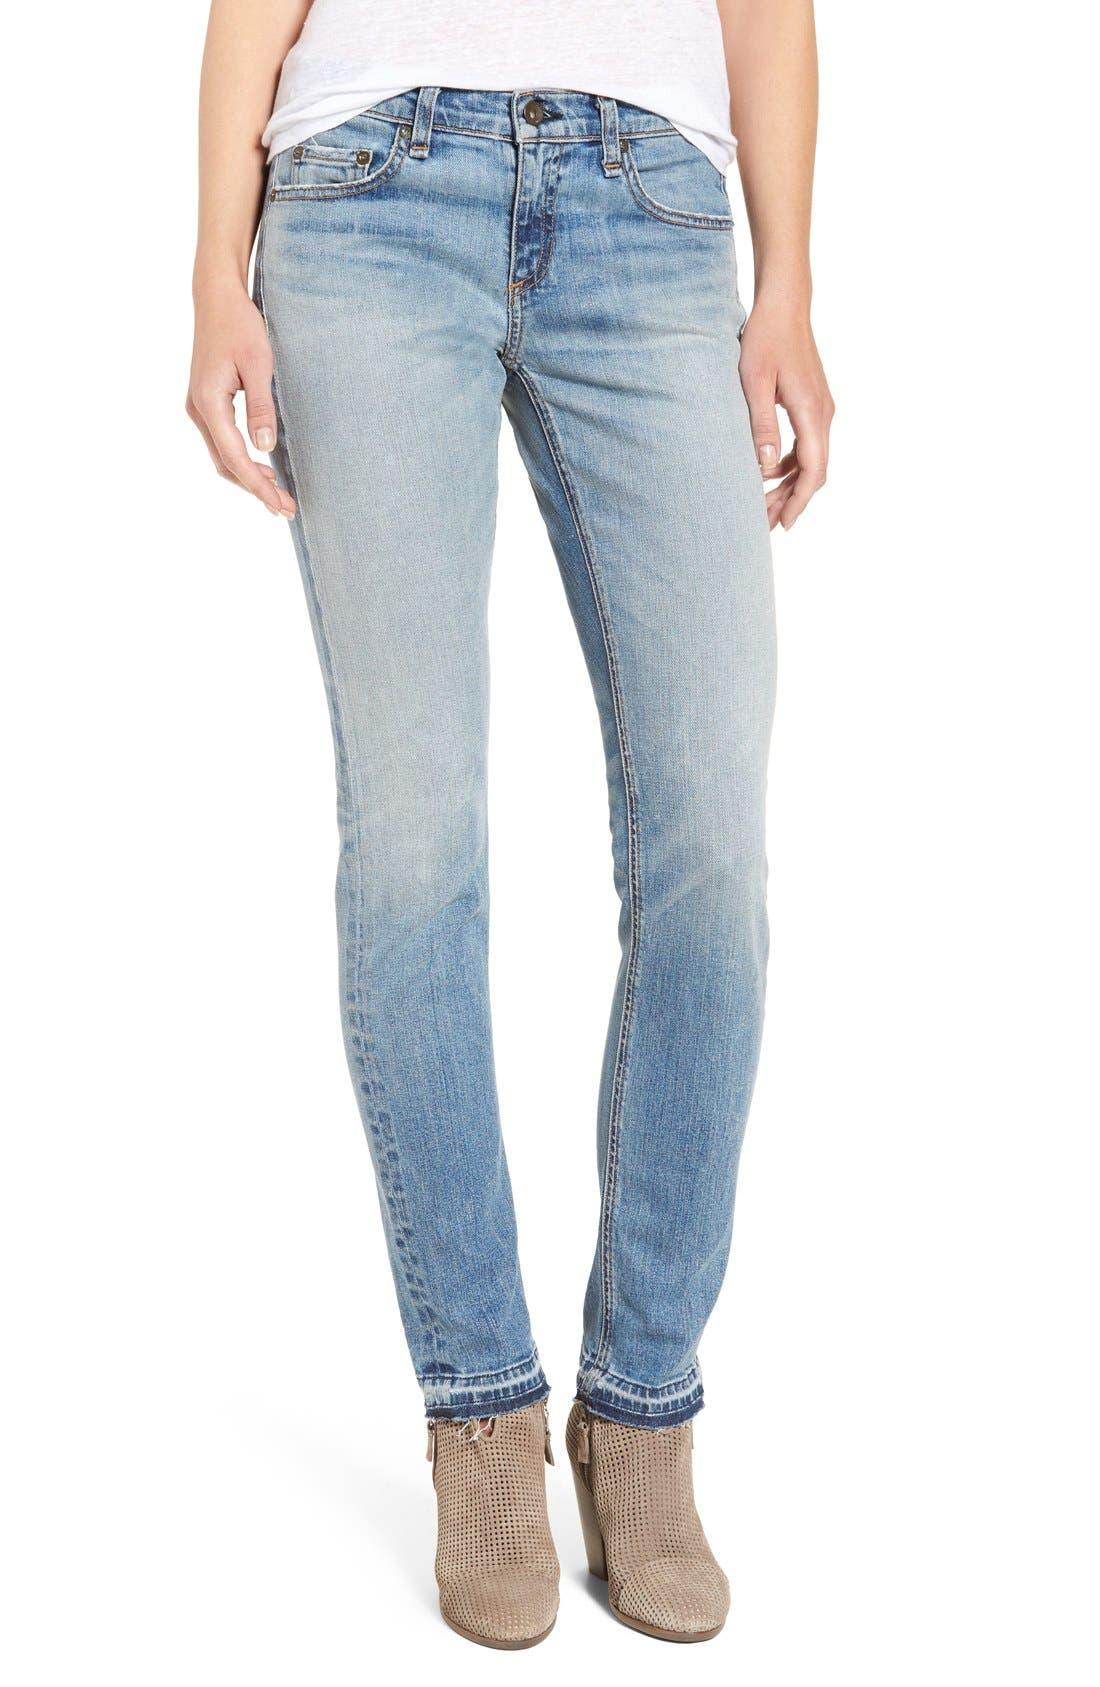 Main Image - rag & bone/JEAN 'The Dre' Slim Boyfriend Jeans